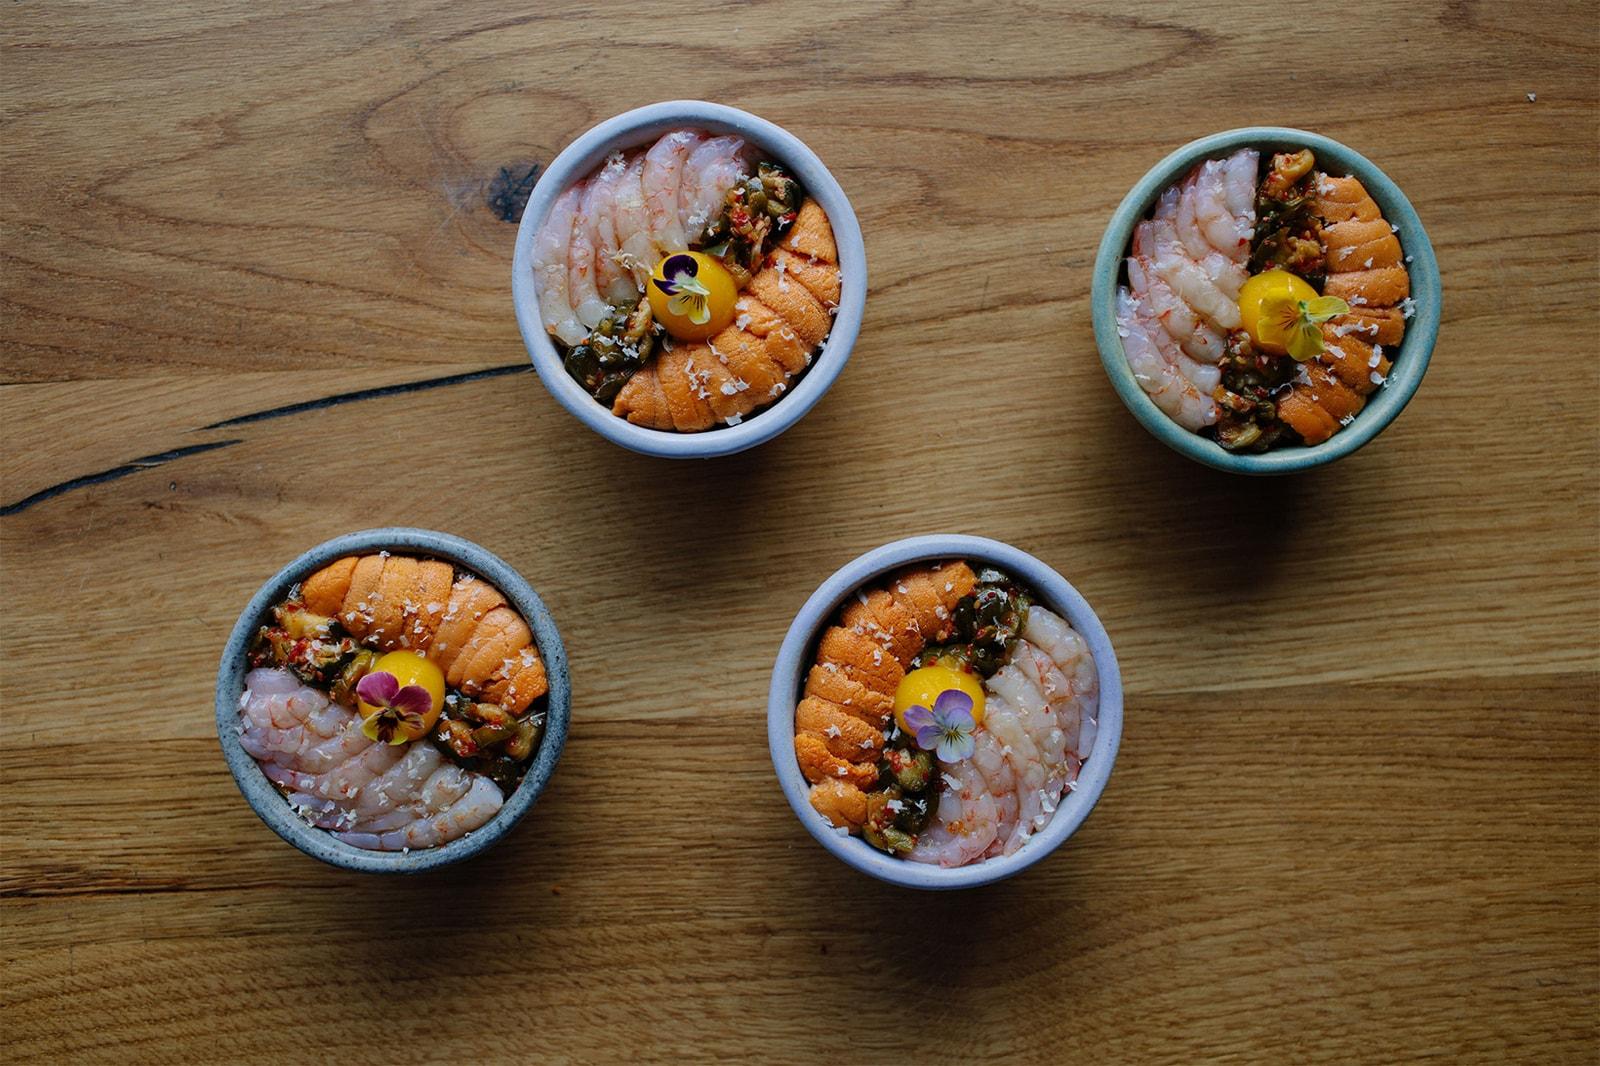 nyc new york best korean restaurants oiji rice bowl uni egg shrimp prawn food